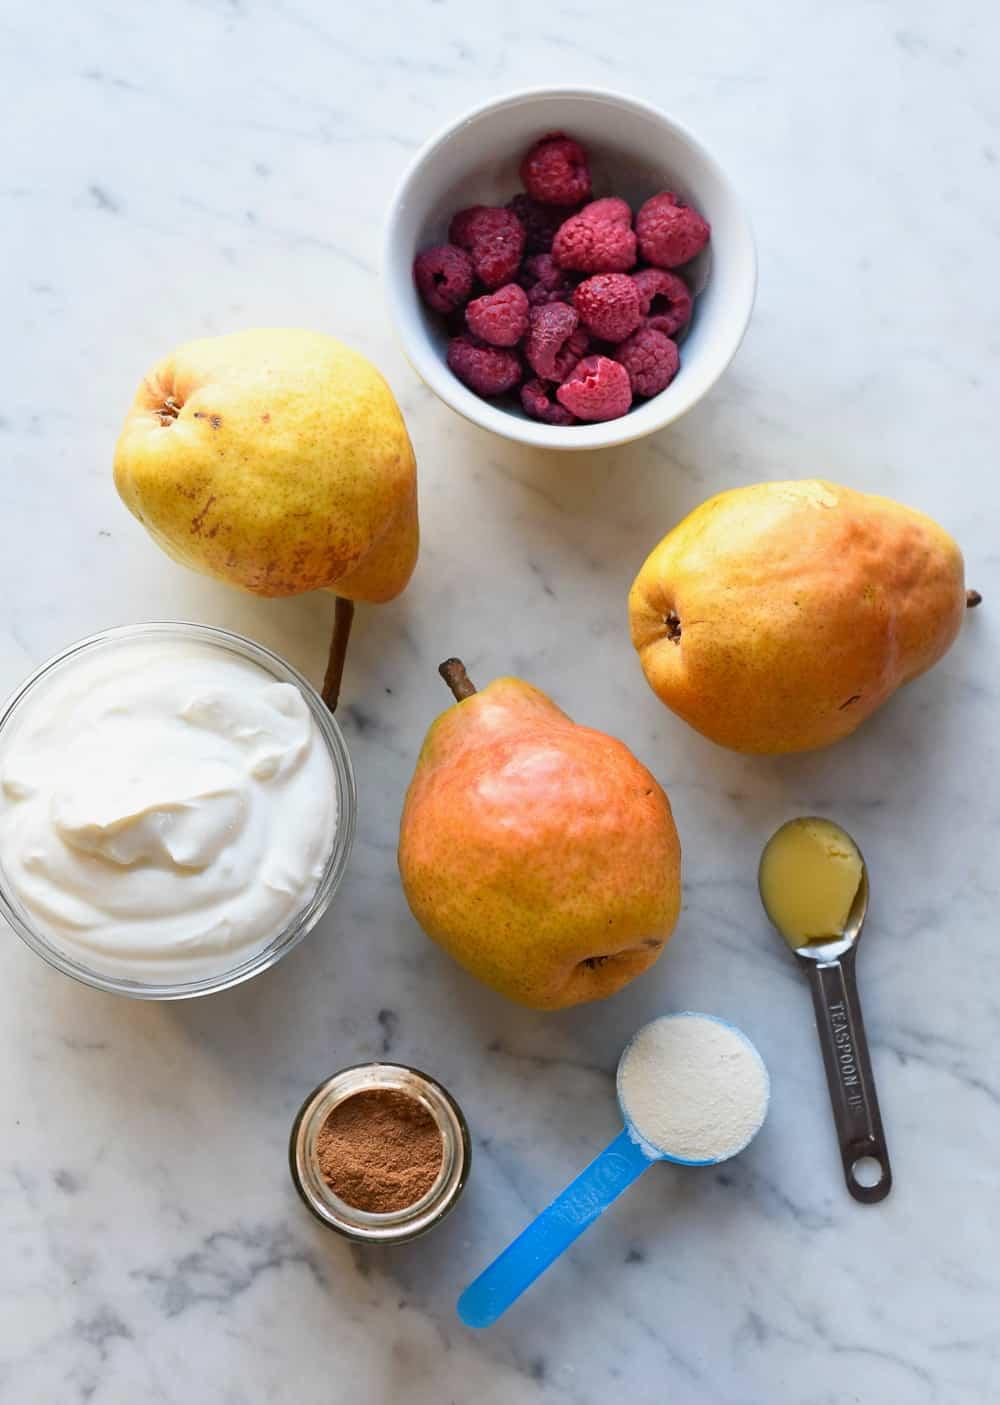 Sauteed Pears with Raspberries and Coconut Yogurt ingredients